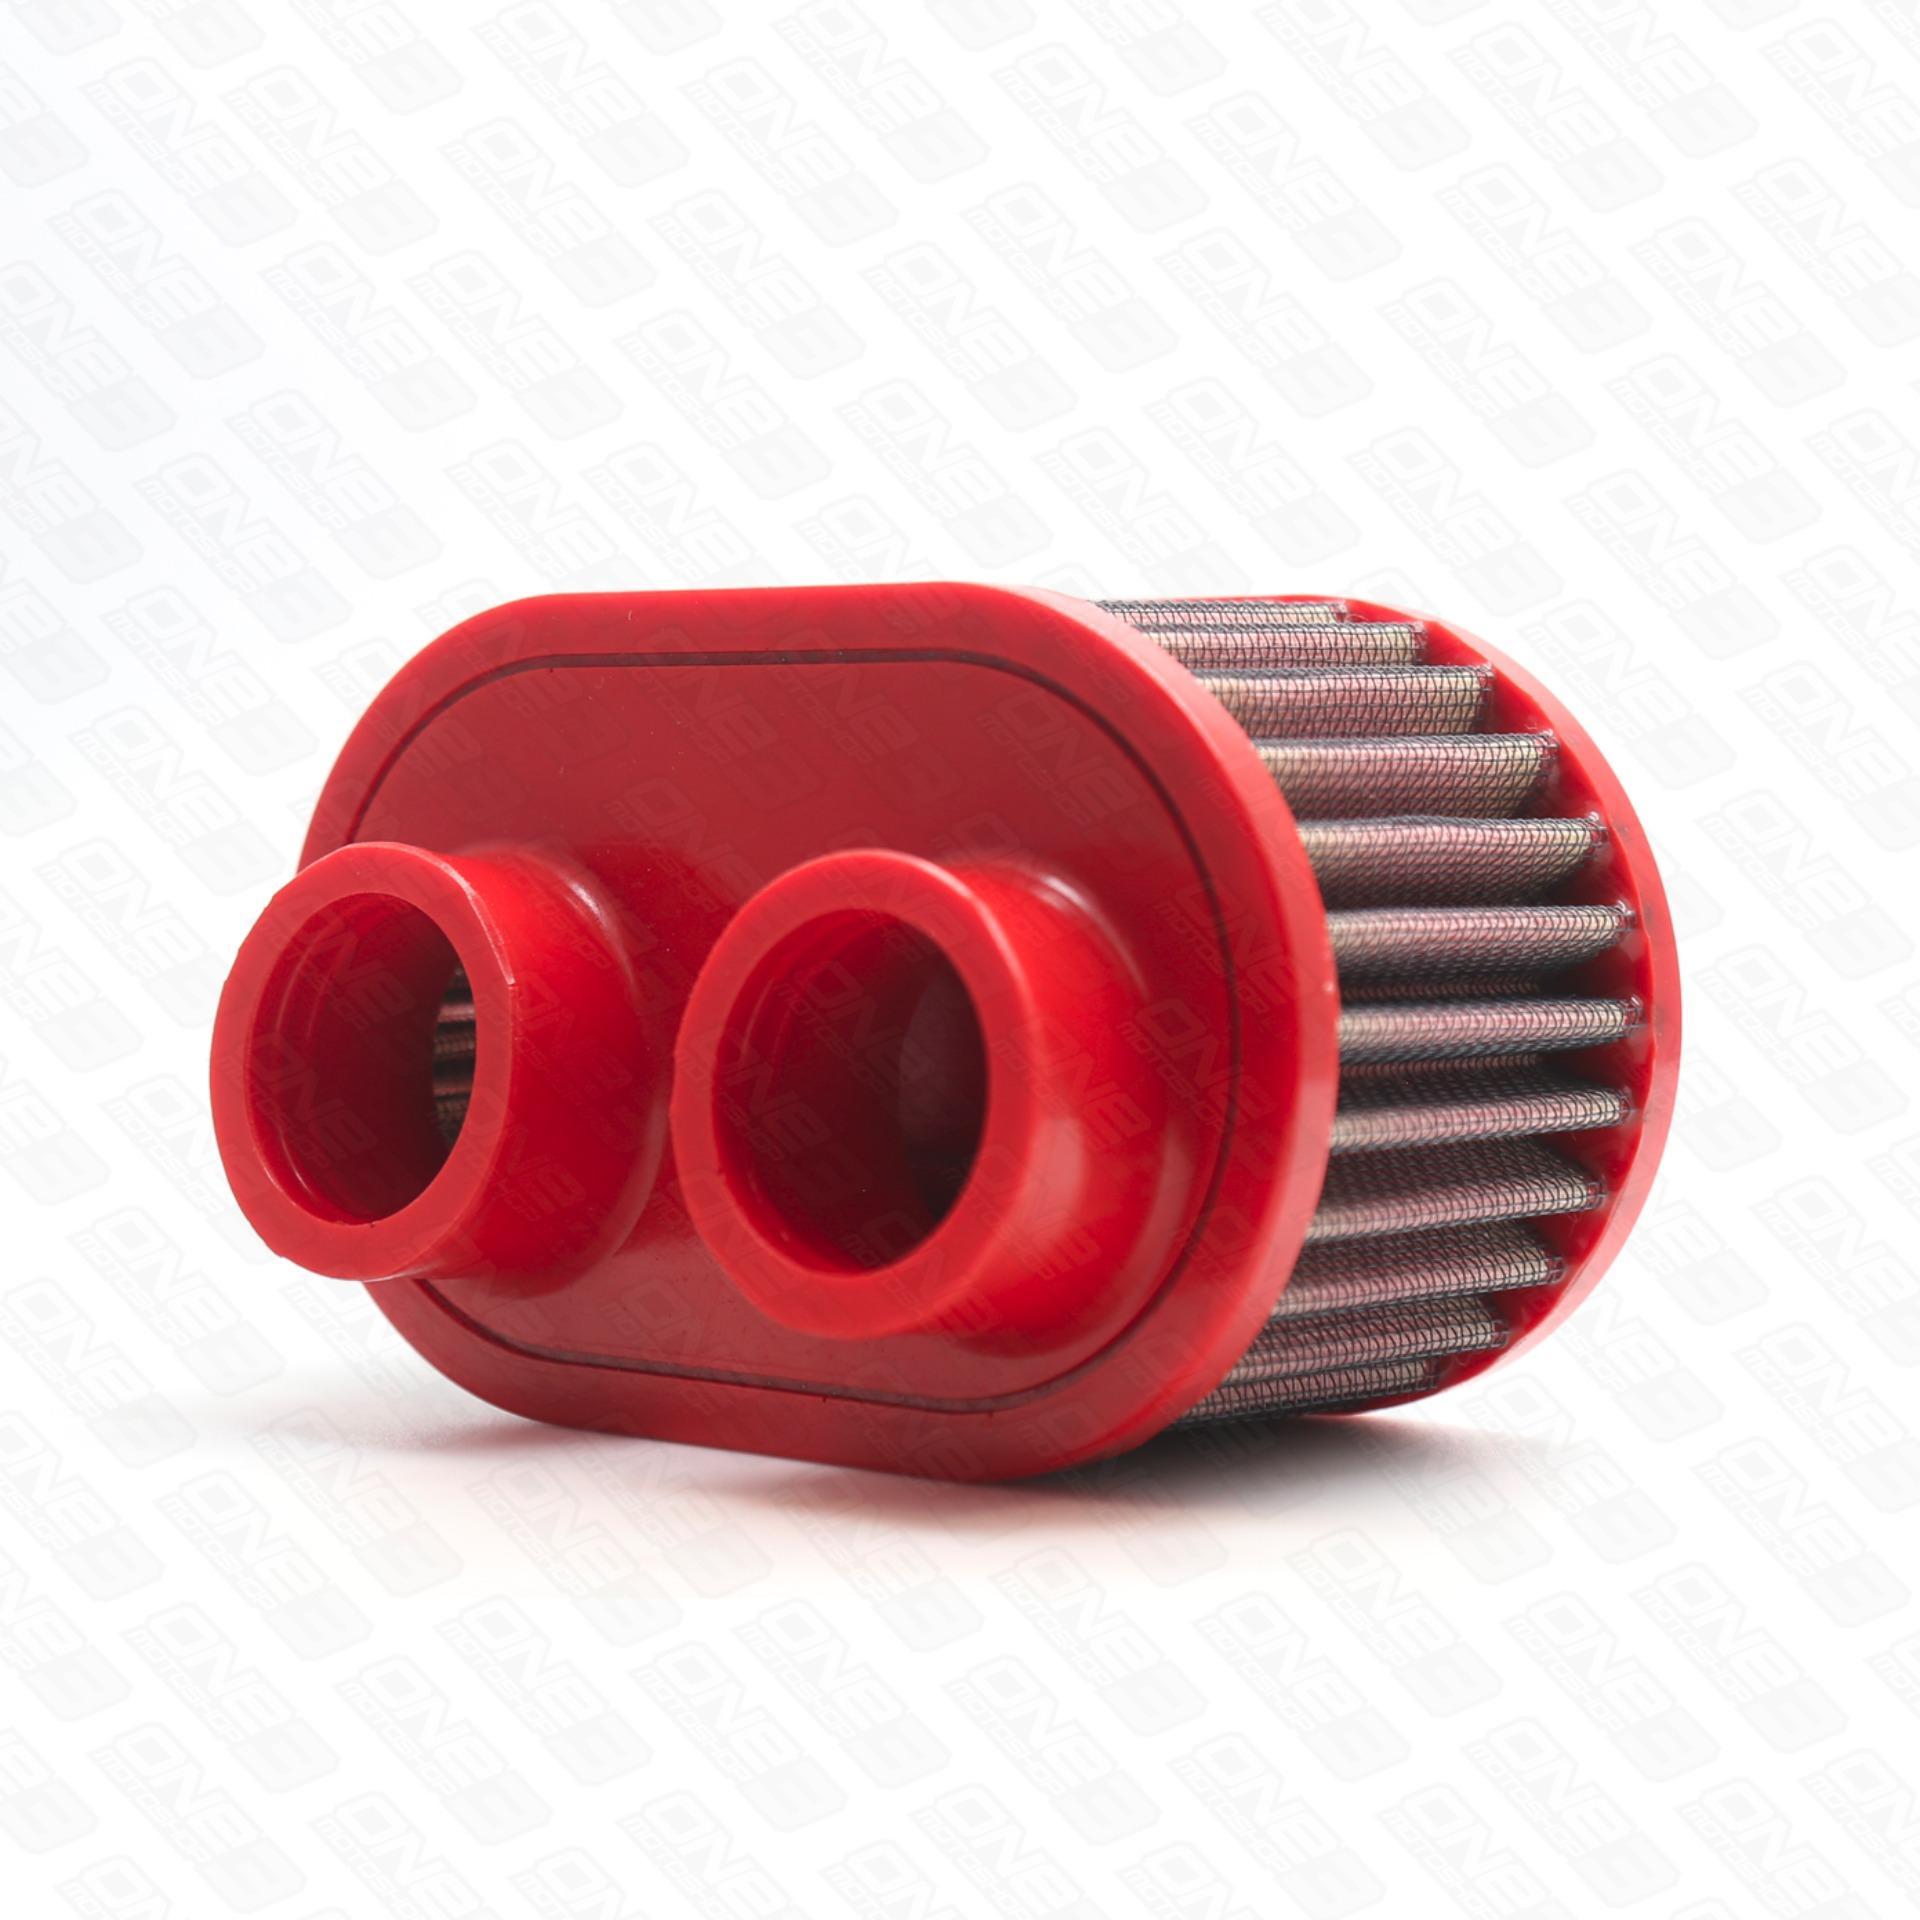 Penawaran Bagus Bmc Air Filter Dual Open Yamaha R25 Pencari Harga Prospeed Black Series Mt 25 Slip On Flash Sale